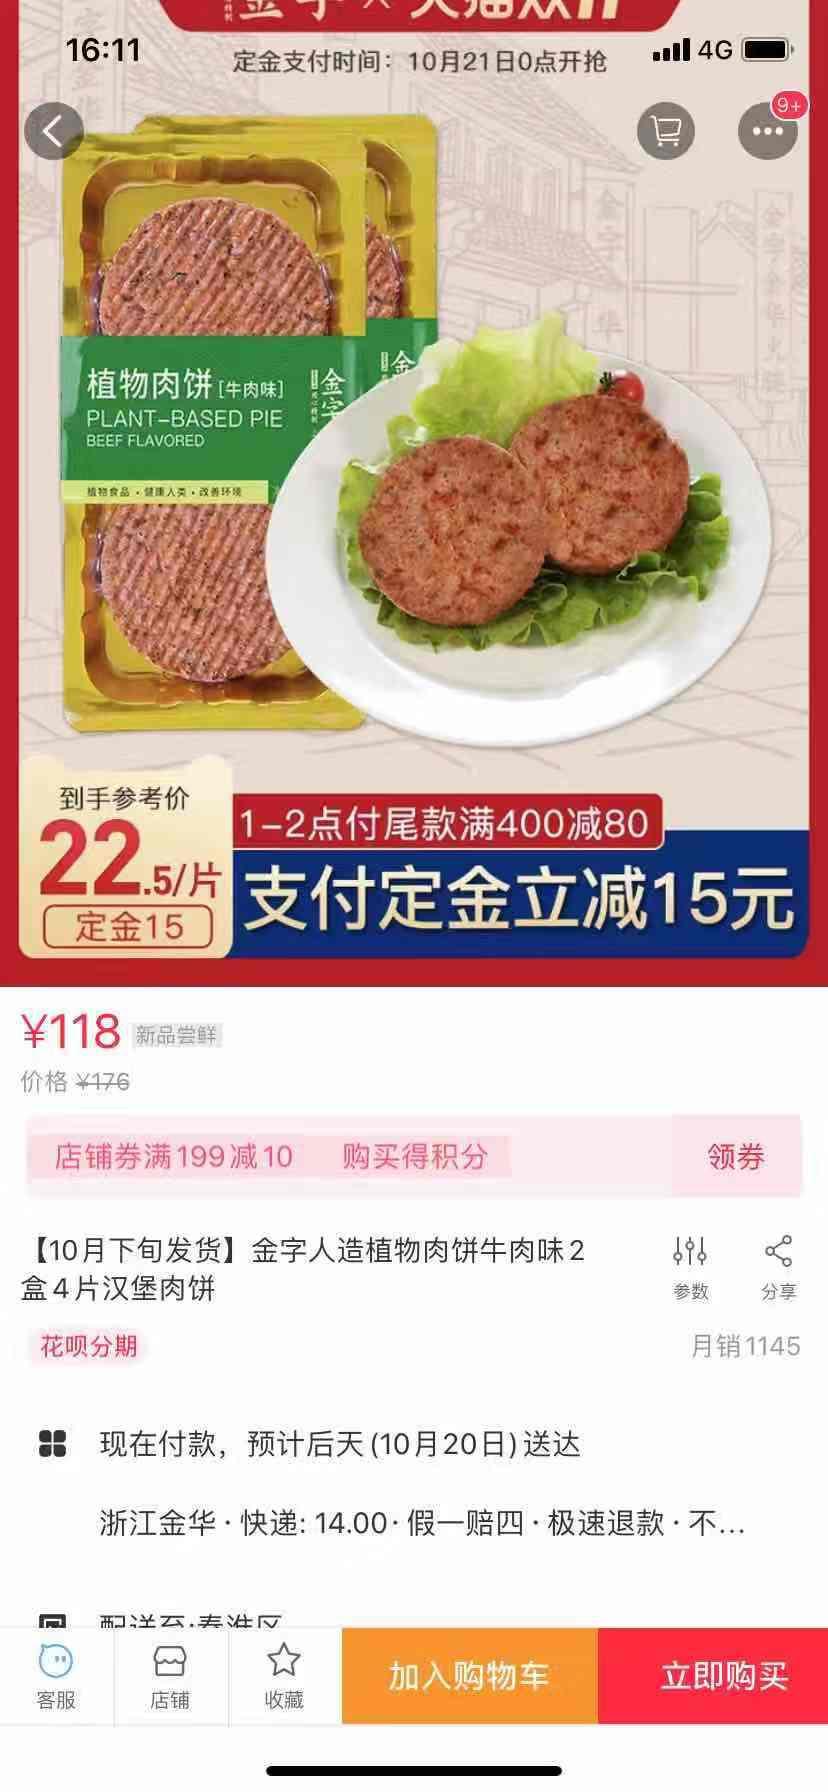 "P2P交流-投资理财金字火腿抢滩""人造肉"",6天收获5涨停理财平台(1)"